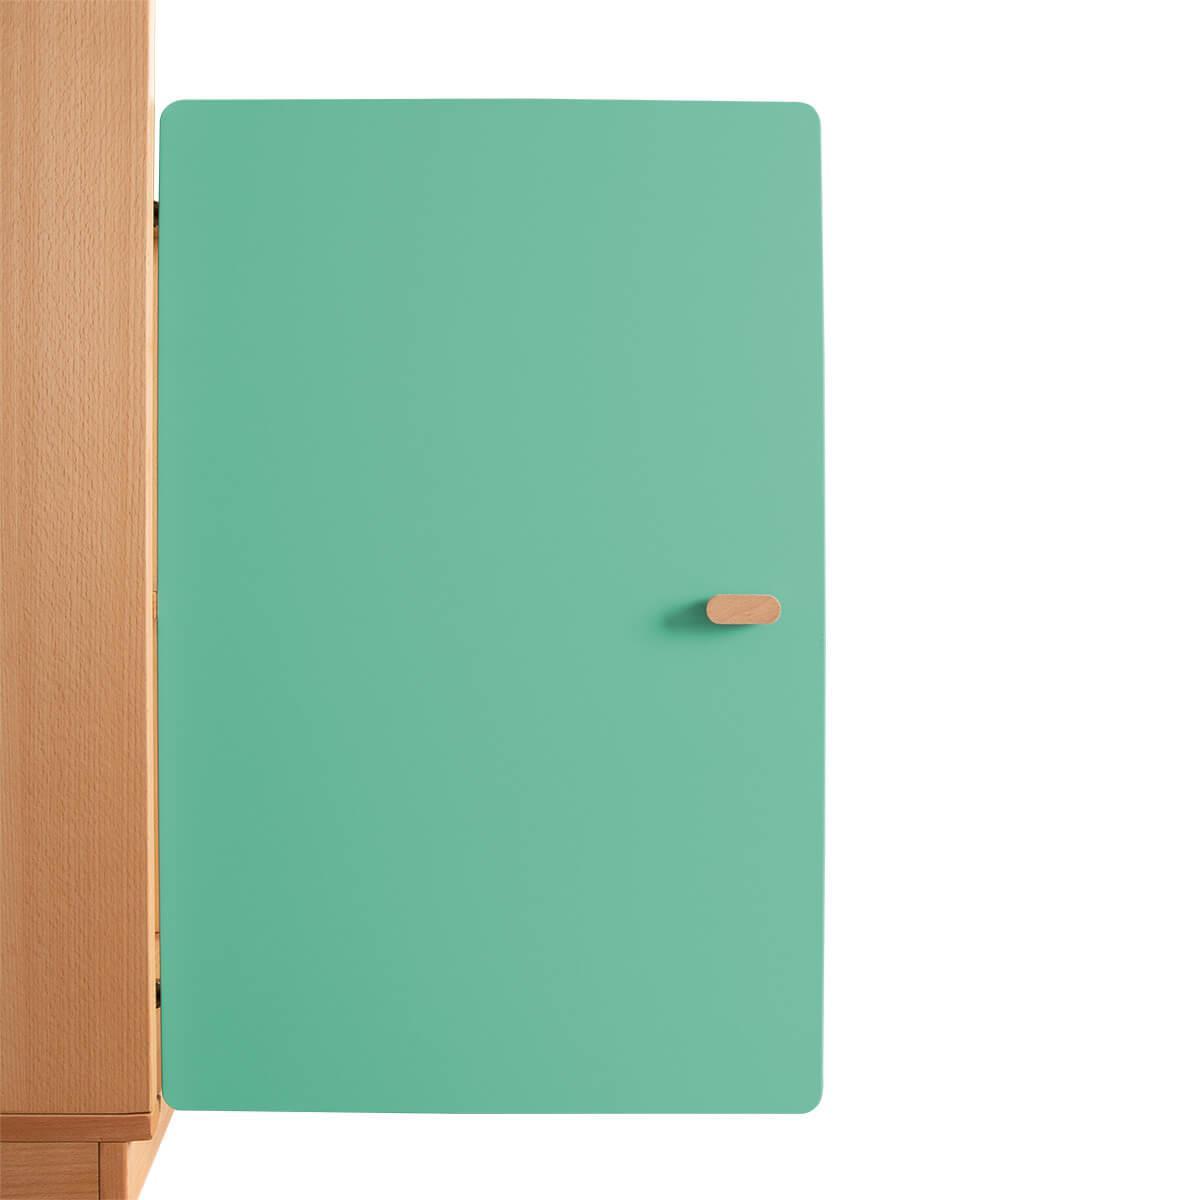 Schranktür 2/5 70cm-Griff DESTYLE de Breuyn MDF grün-lackiert